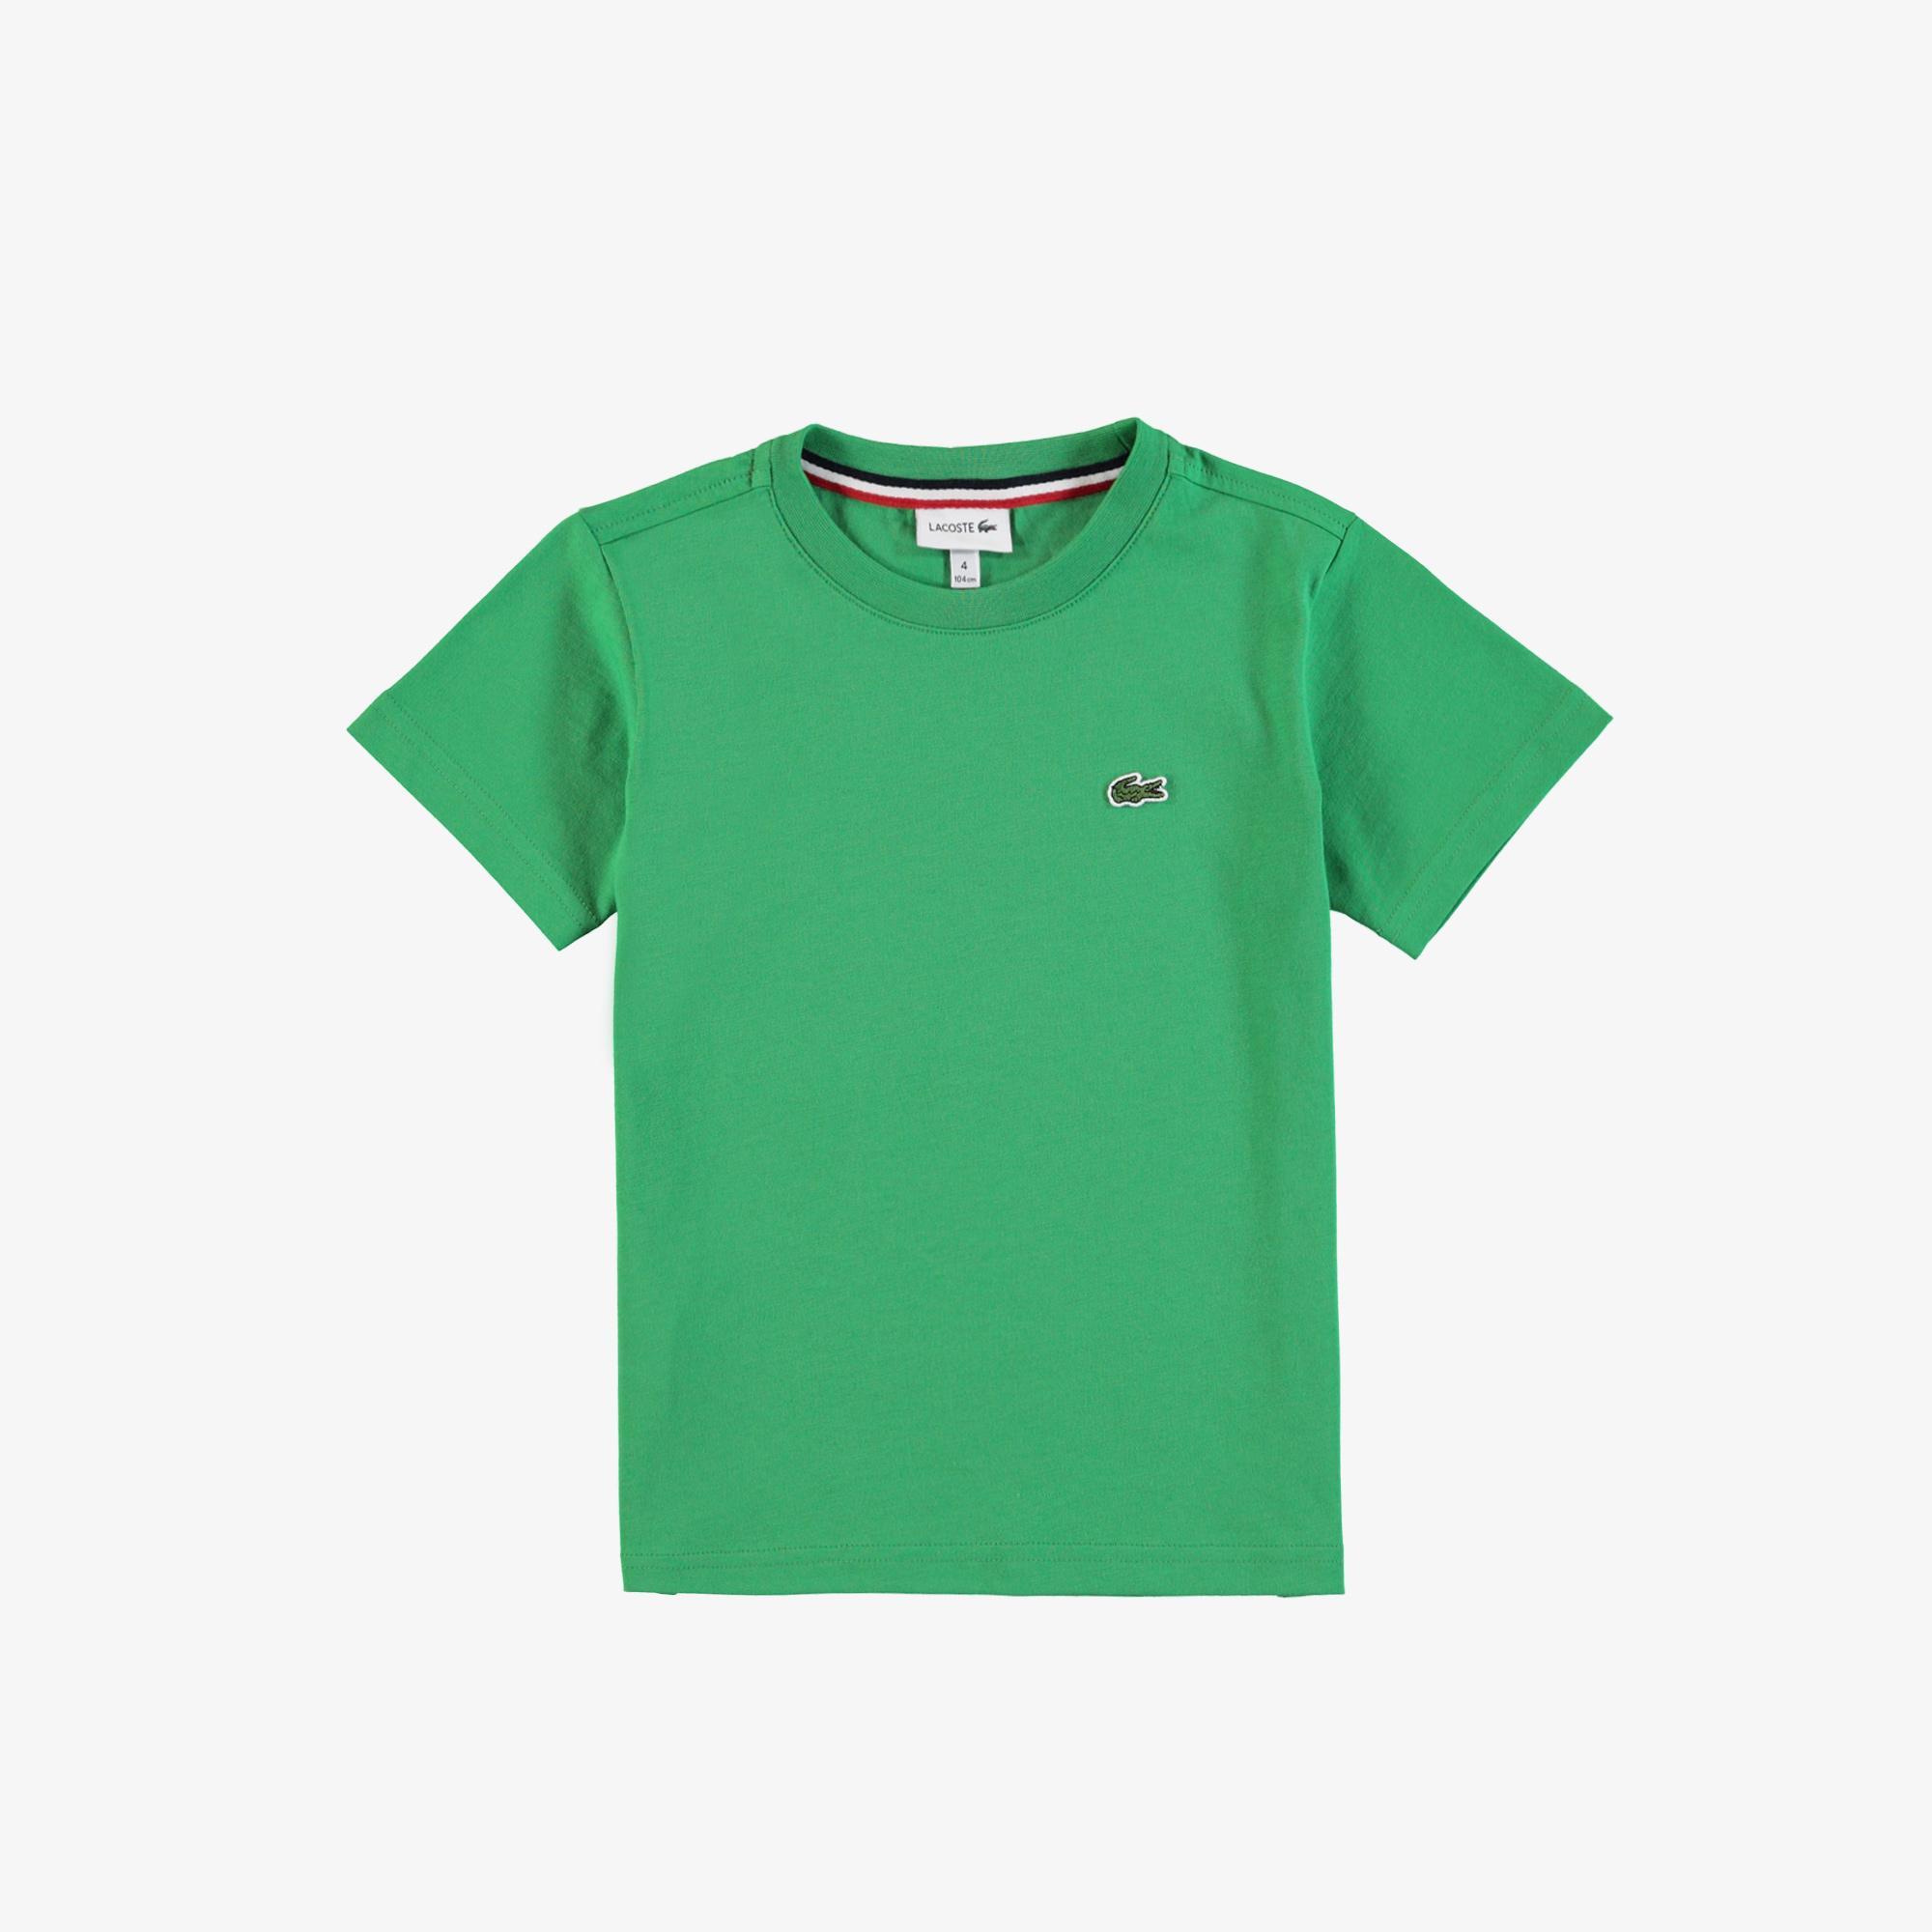 Lacoste Çocuk Bisiklet Yaka Yeşil T-Shirt